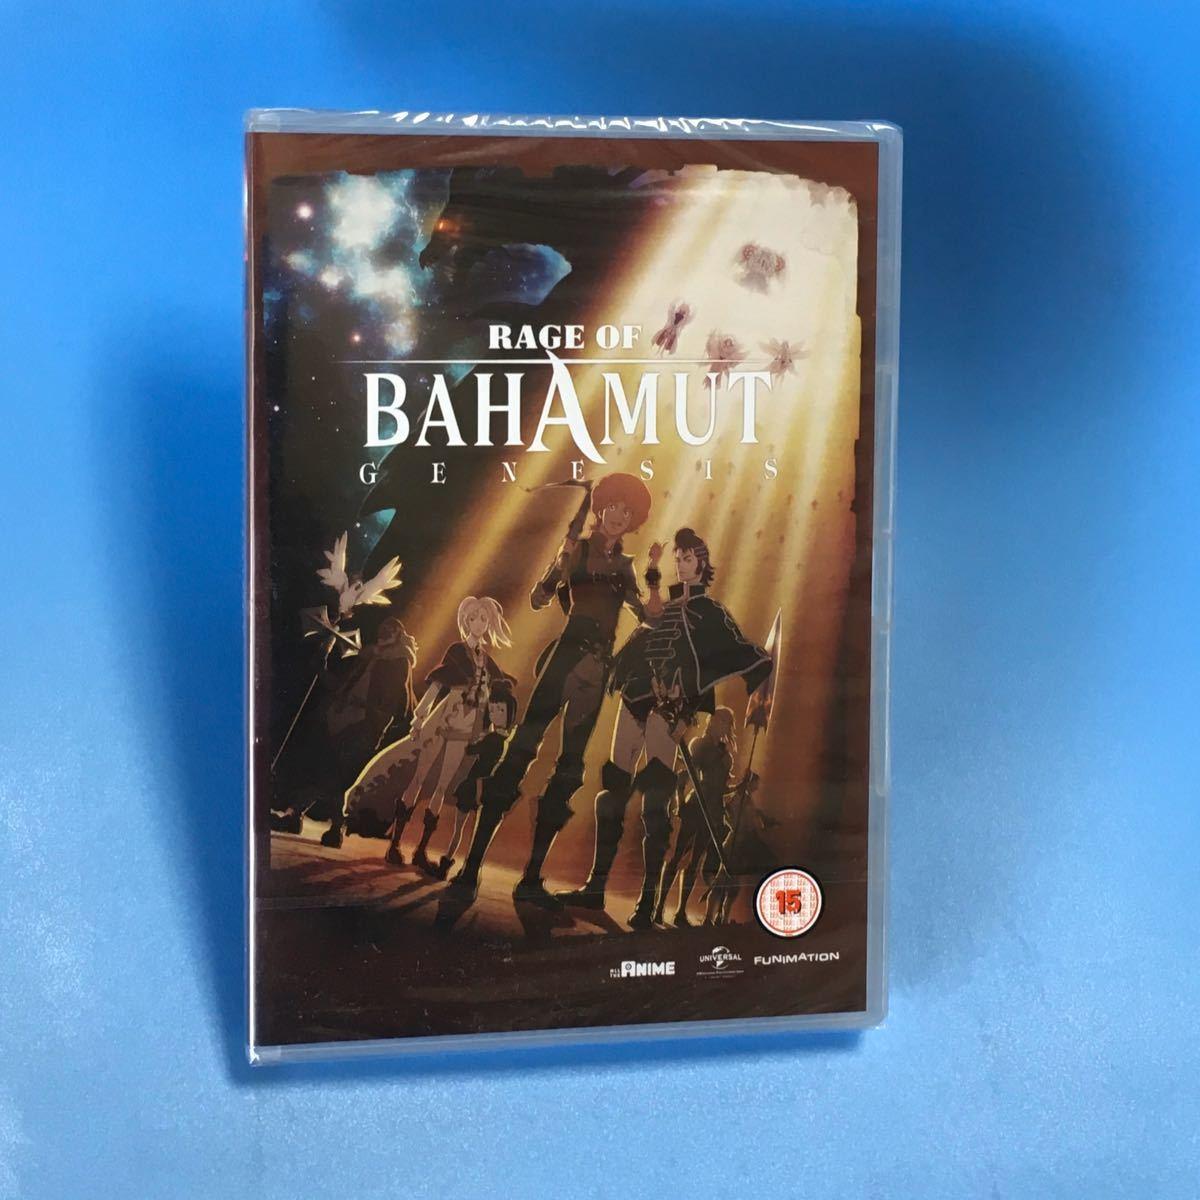 DVD-BOX 進撃のバハムート BAHAMUT 英国版・未開封品・日本語対応